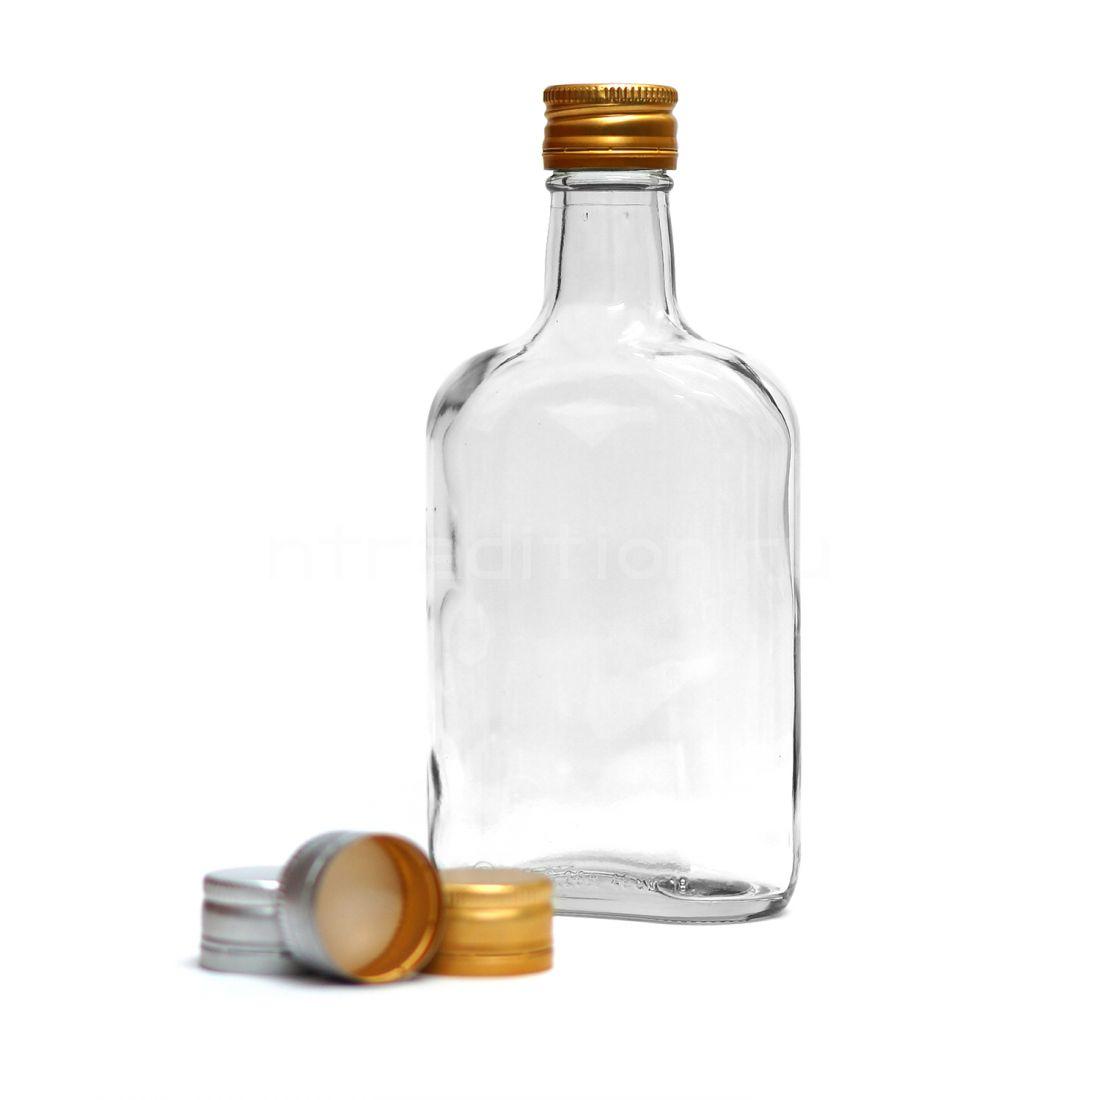 Бутылка Фляжка, под винт 28*18 0,25 л / 24 шт